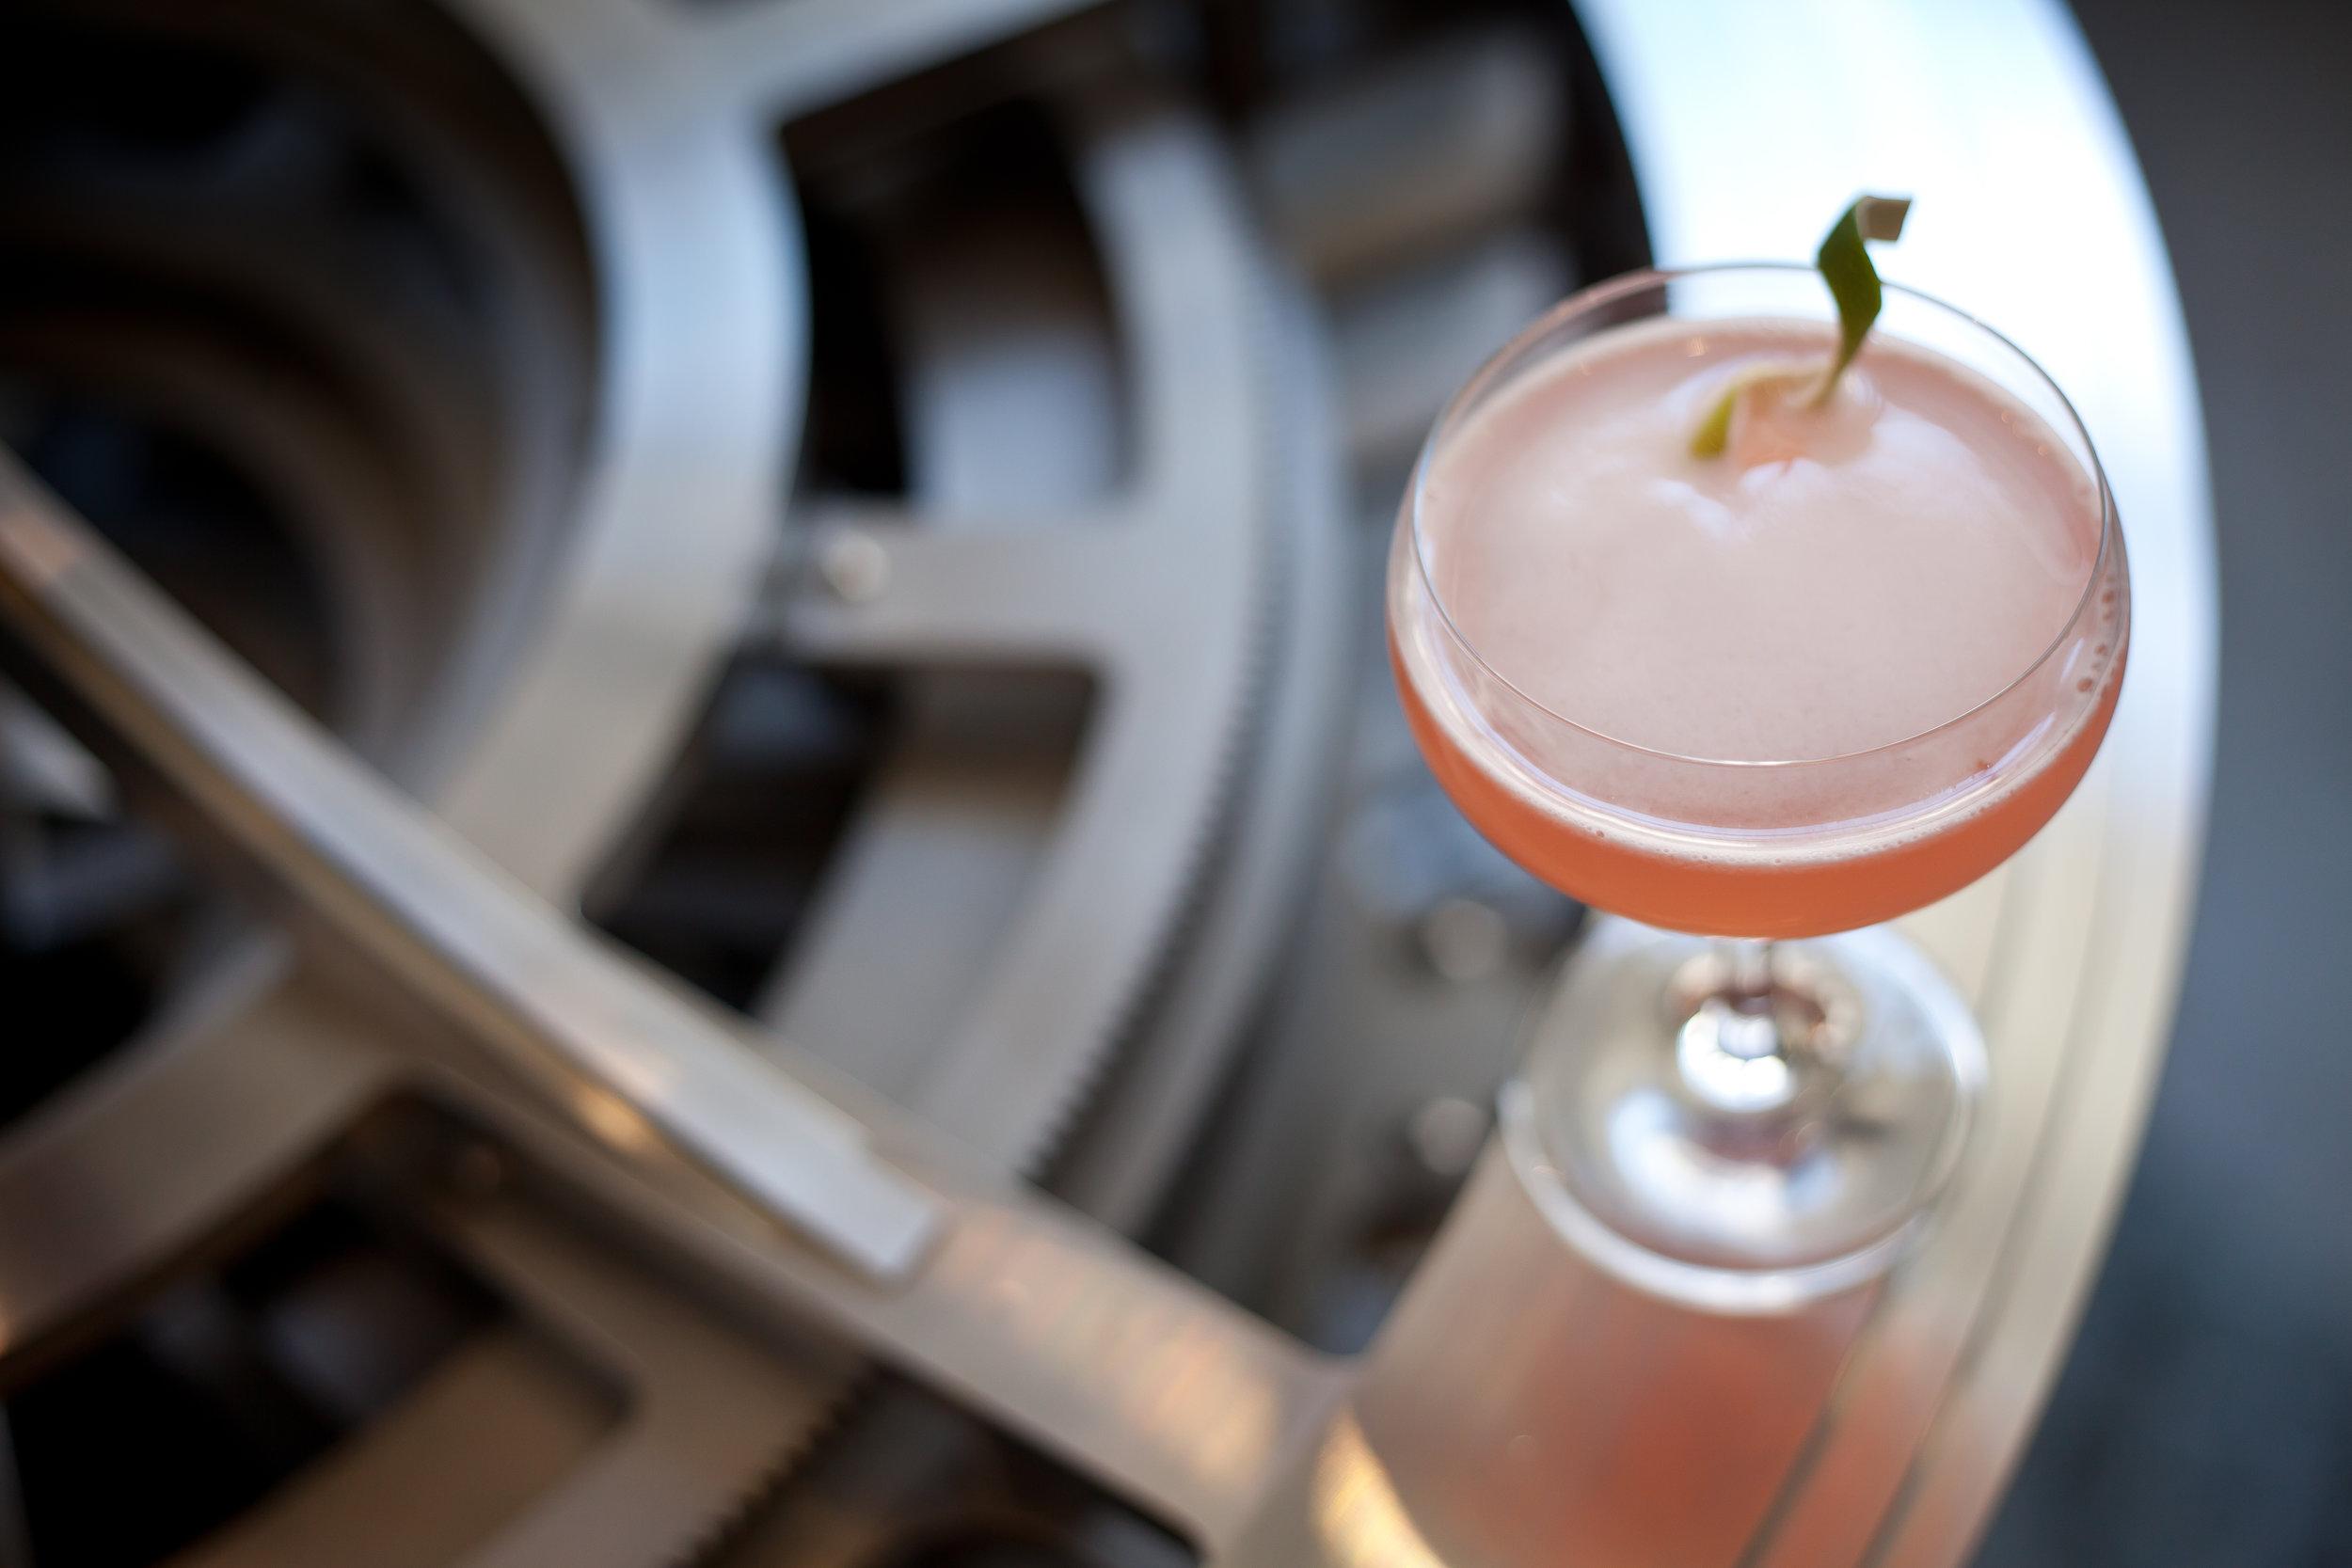 shf-2014-drinks-1611.jpg